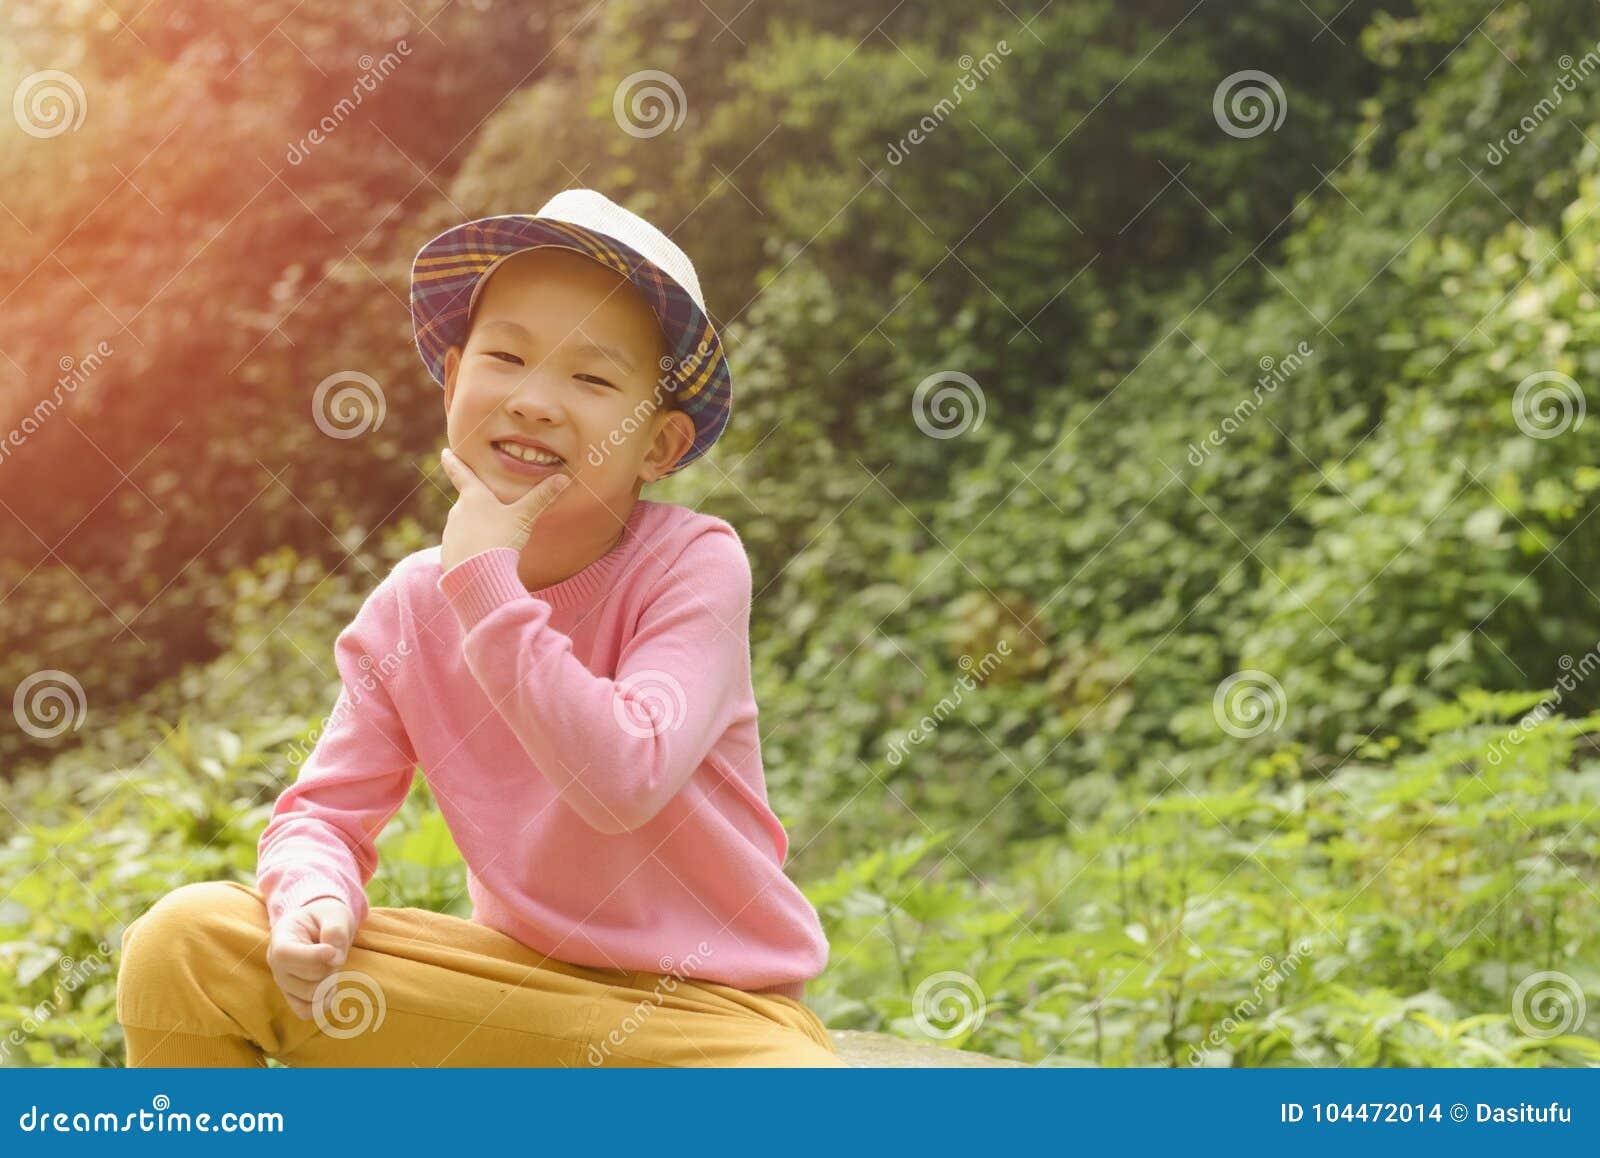 A plant that makes children happy 22